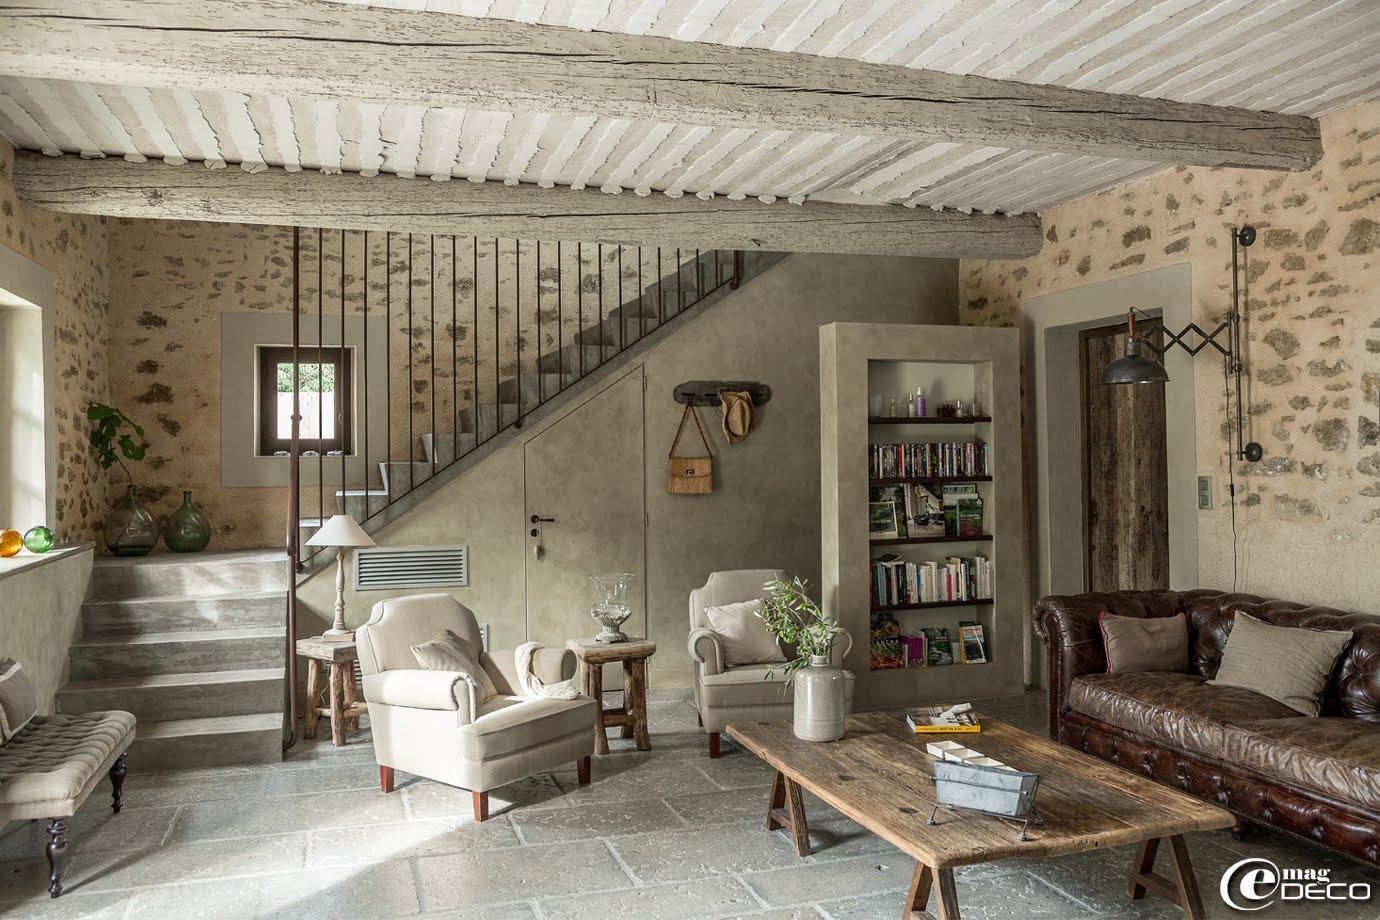 la bergerie de nano e magdeco magazine de d coration. Black Bedroom Furniture Sets. Home Design Ideas